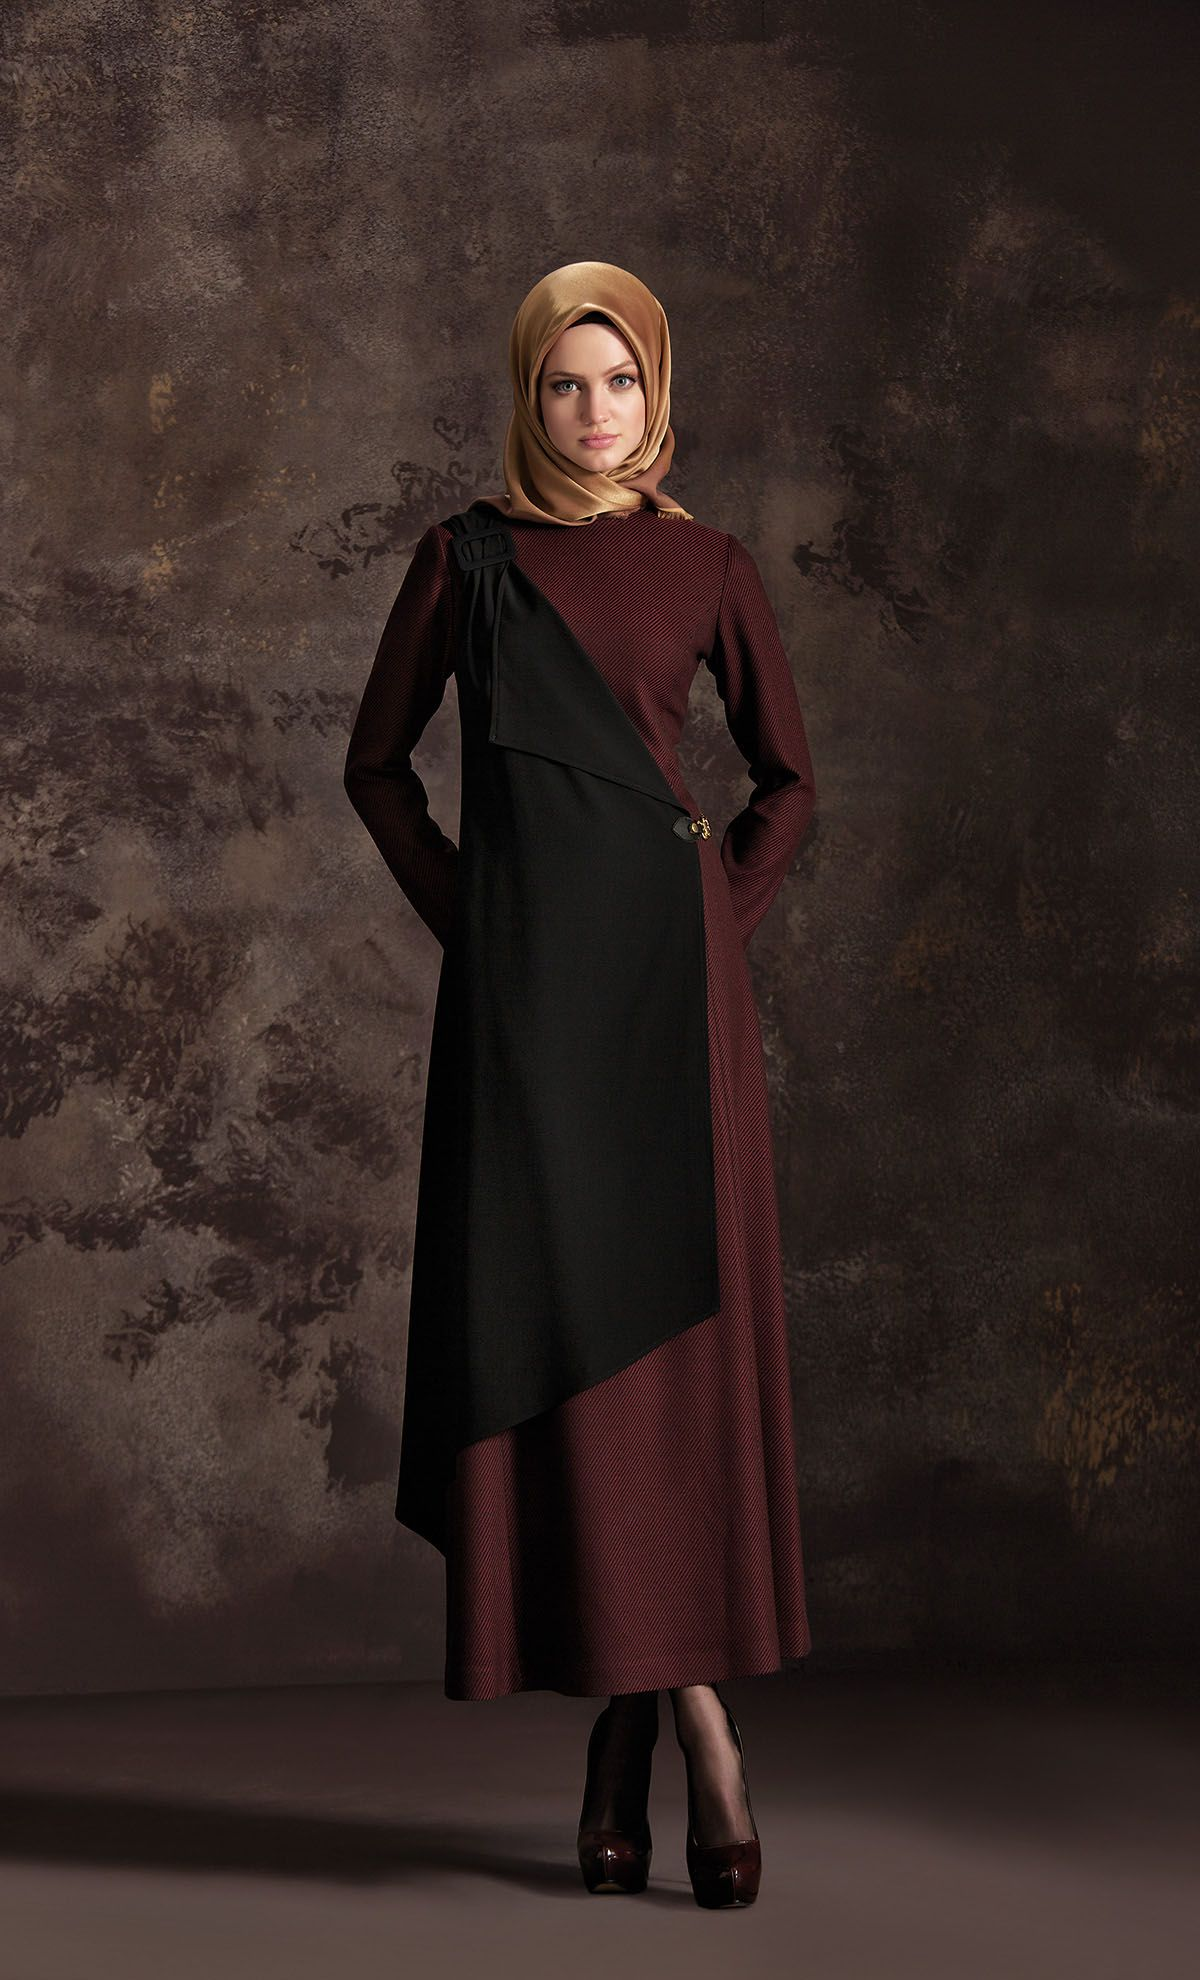 Tuaÿba Store Tesetta R Giyim Tesetta R Elbise Pardesa Manto Online Ala Aÿveriaÿ Model Pakaian Gaya Busana Pakaian Wanita